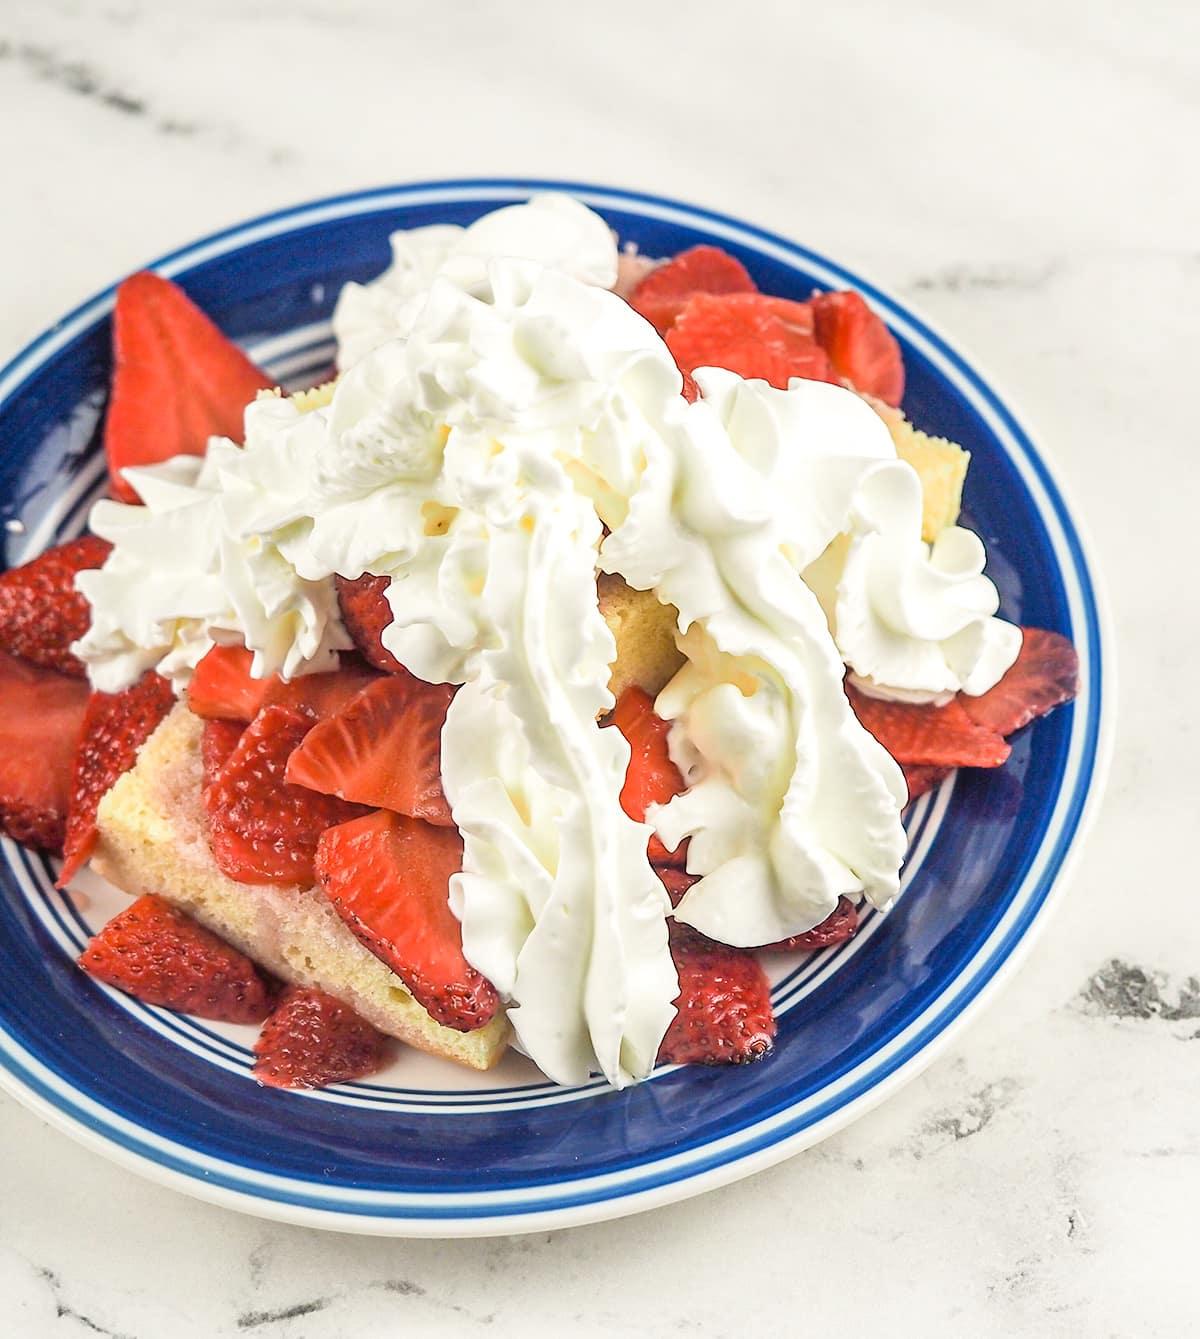 strawberry shortcake on blue rimmed plate